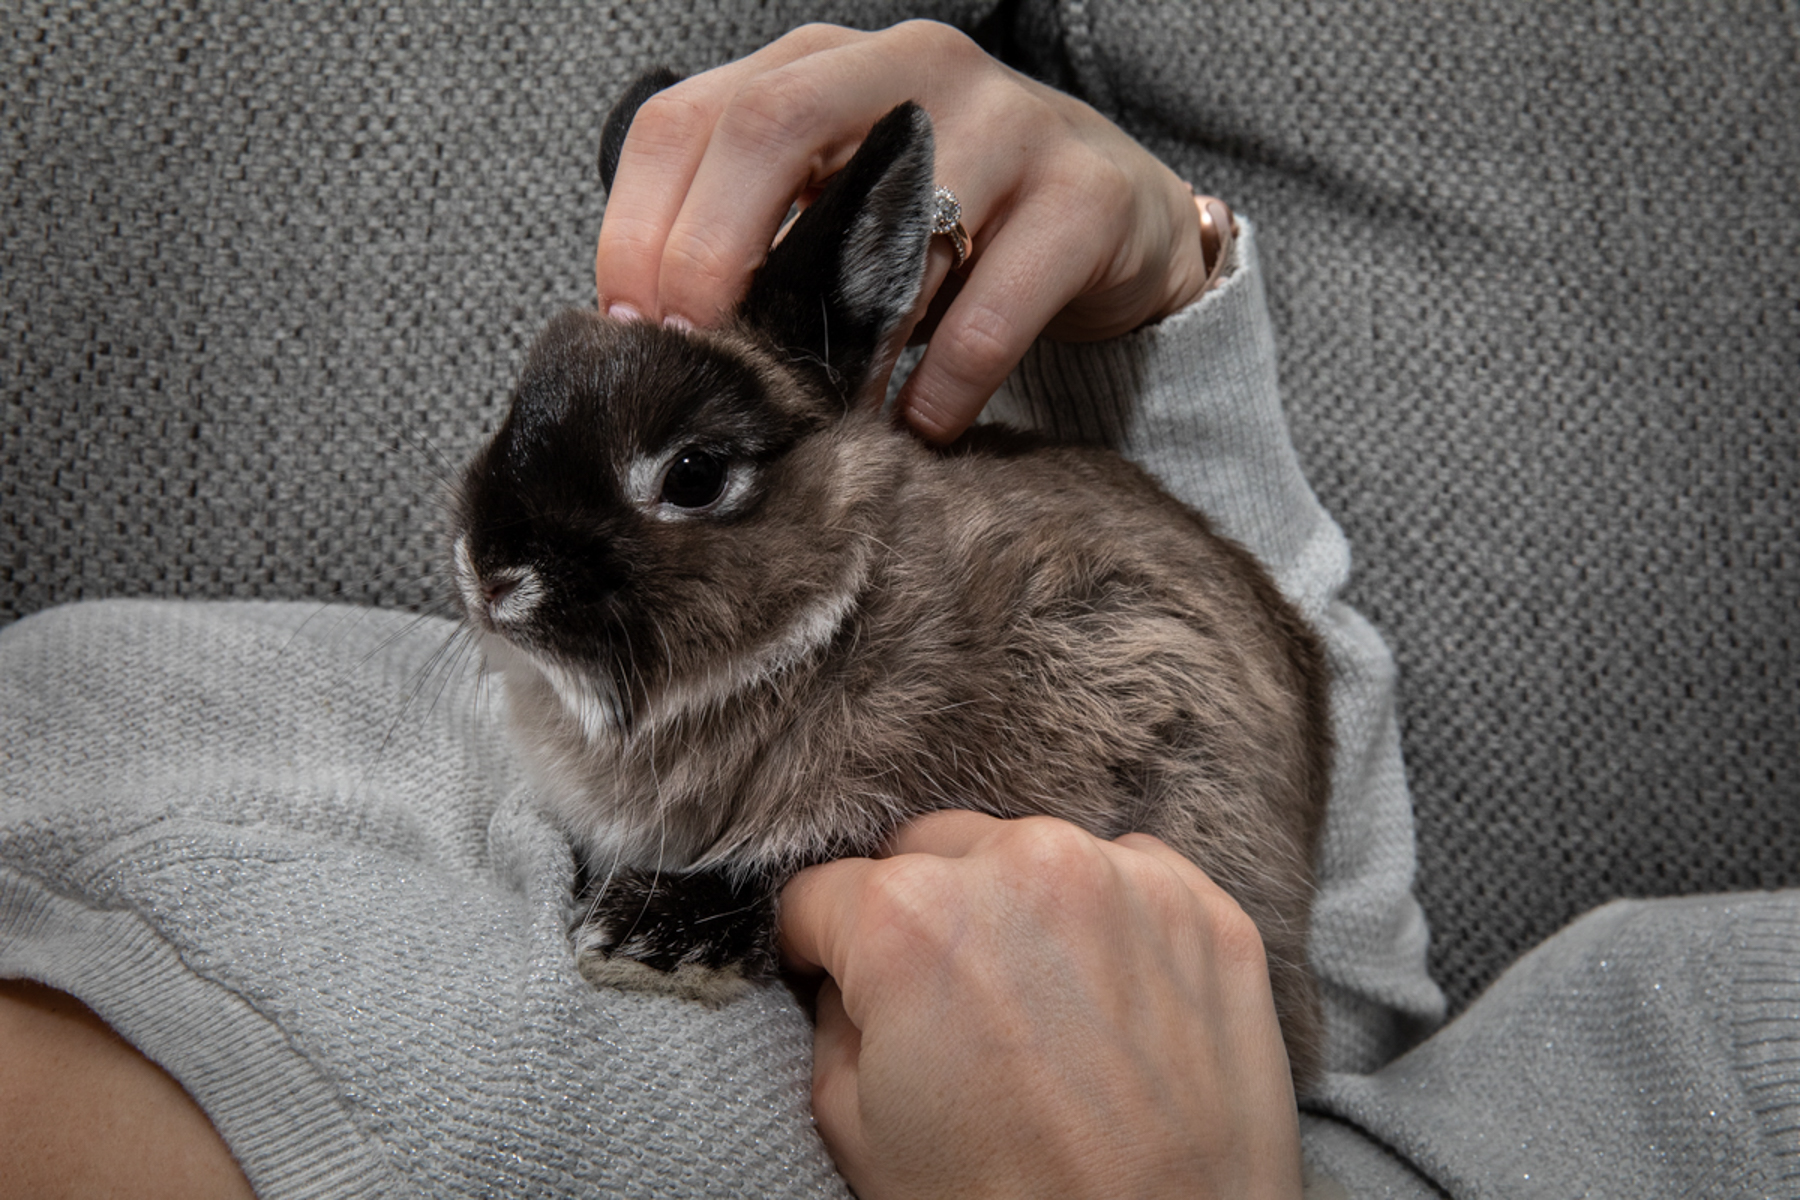 Pierce the rabbit